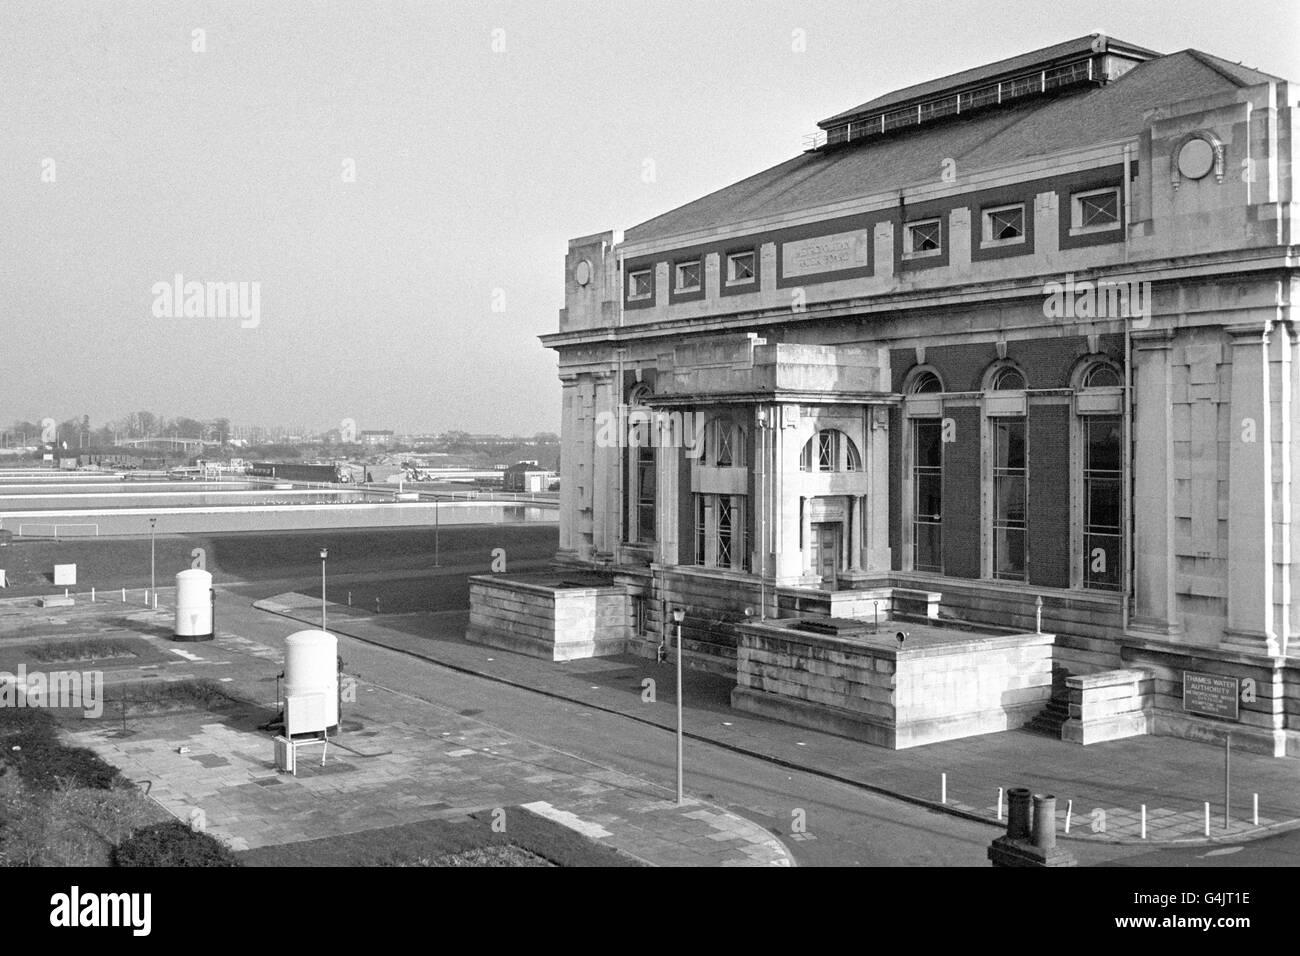 Buildings & Landmarks - Kempton Park Waterworks Stock Photo